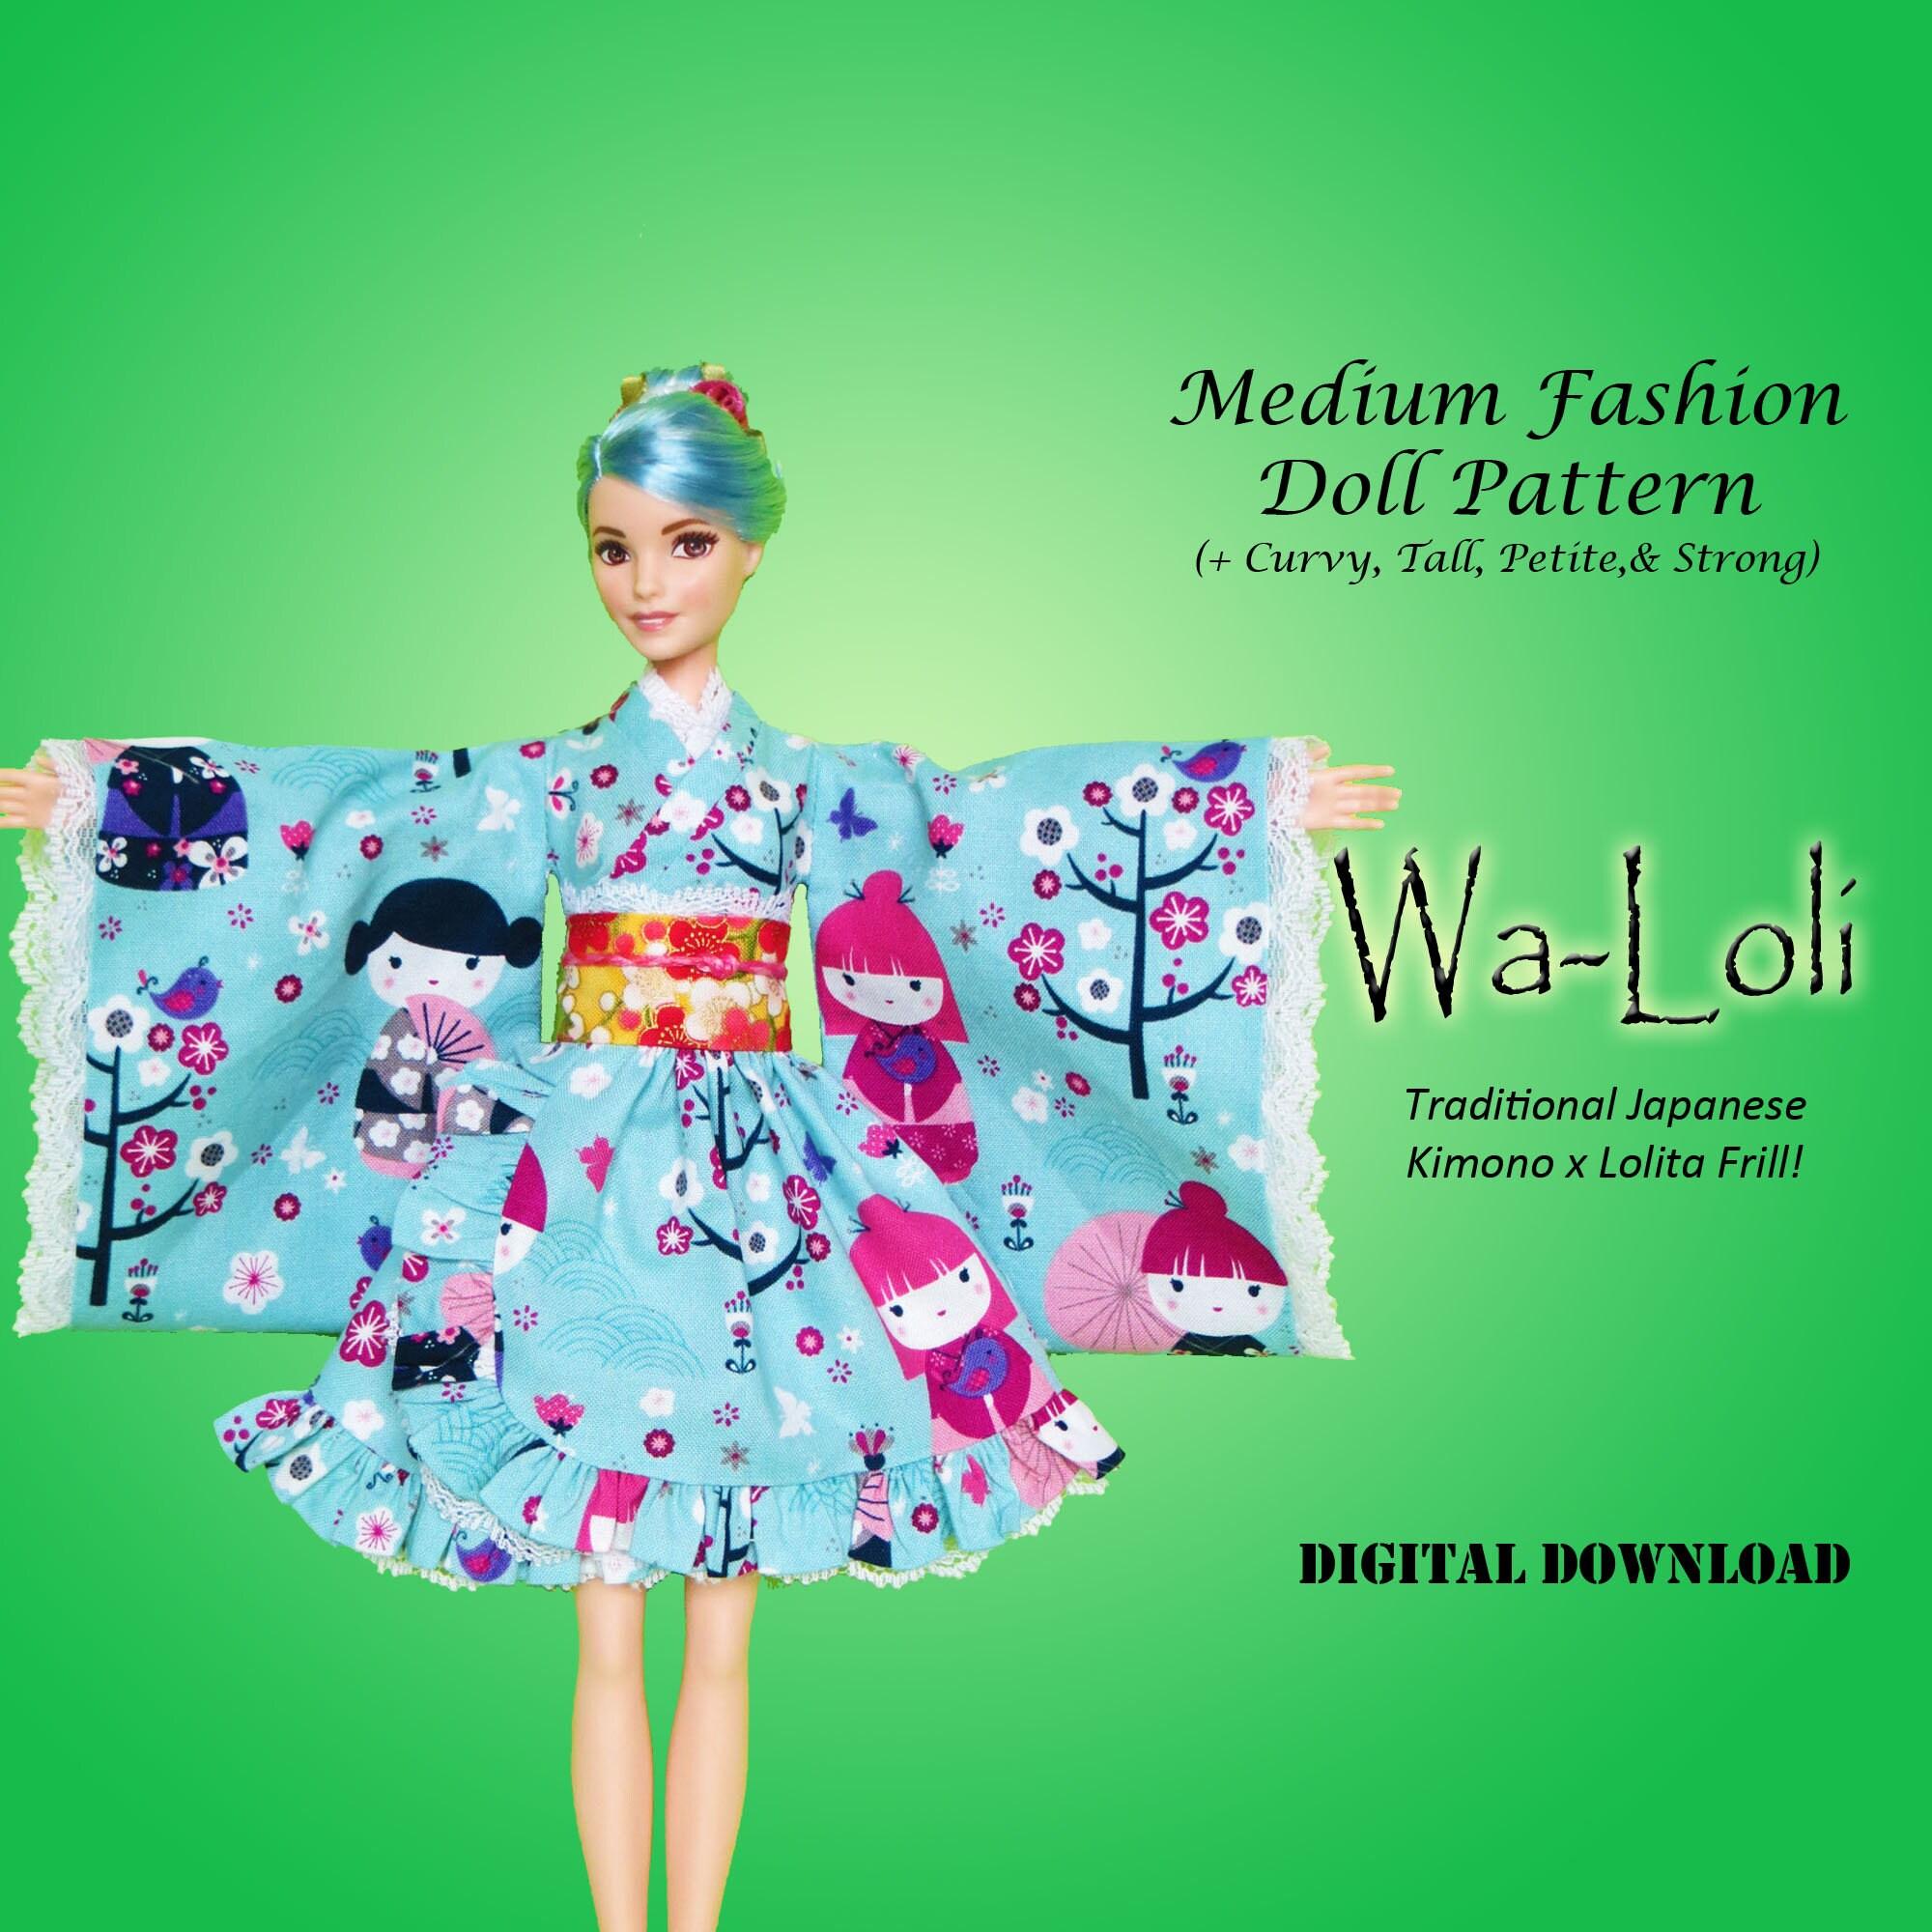 Wa Loli kimono lolita Doll Clothes PDF Sewing pattern for